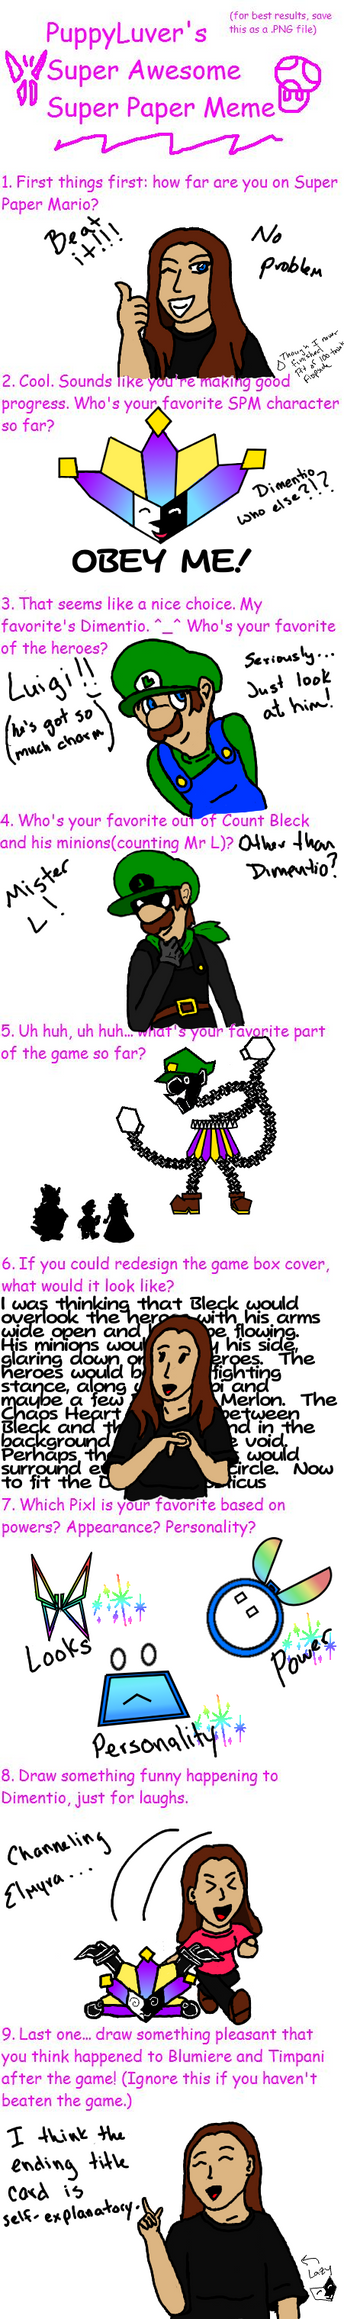 Super Paper Mario meme by starhavenstudios